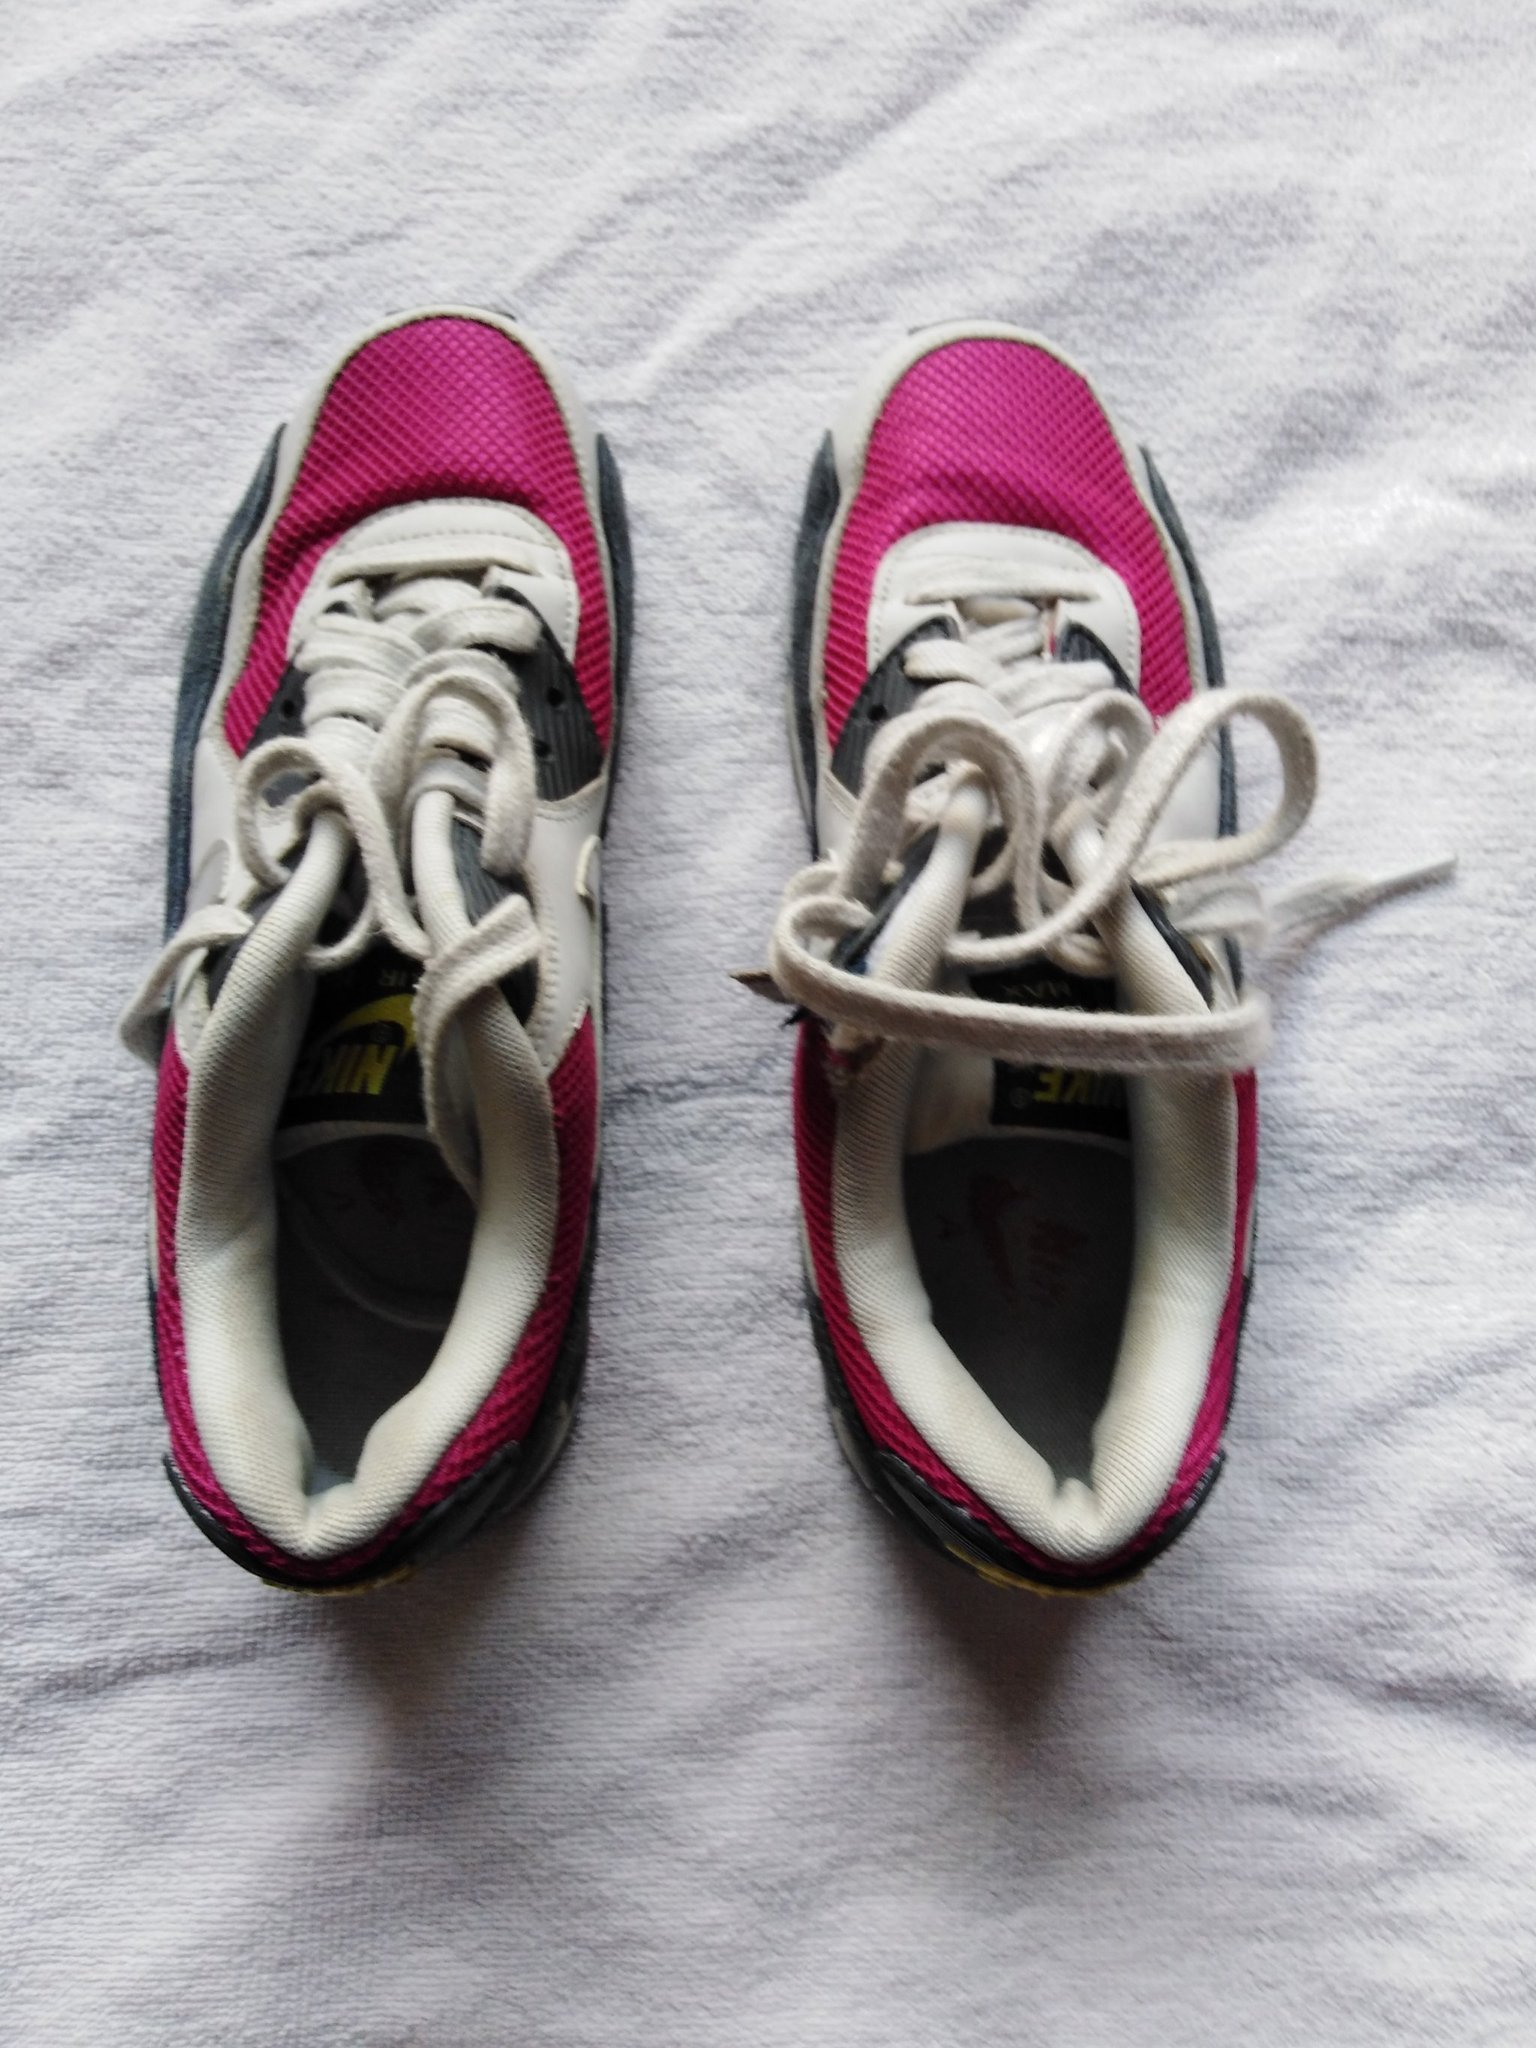 Nike air skor rosa vita m?rkgr? silver stl: 39 (349987367